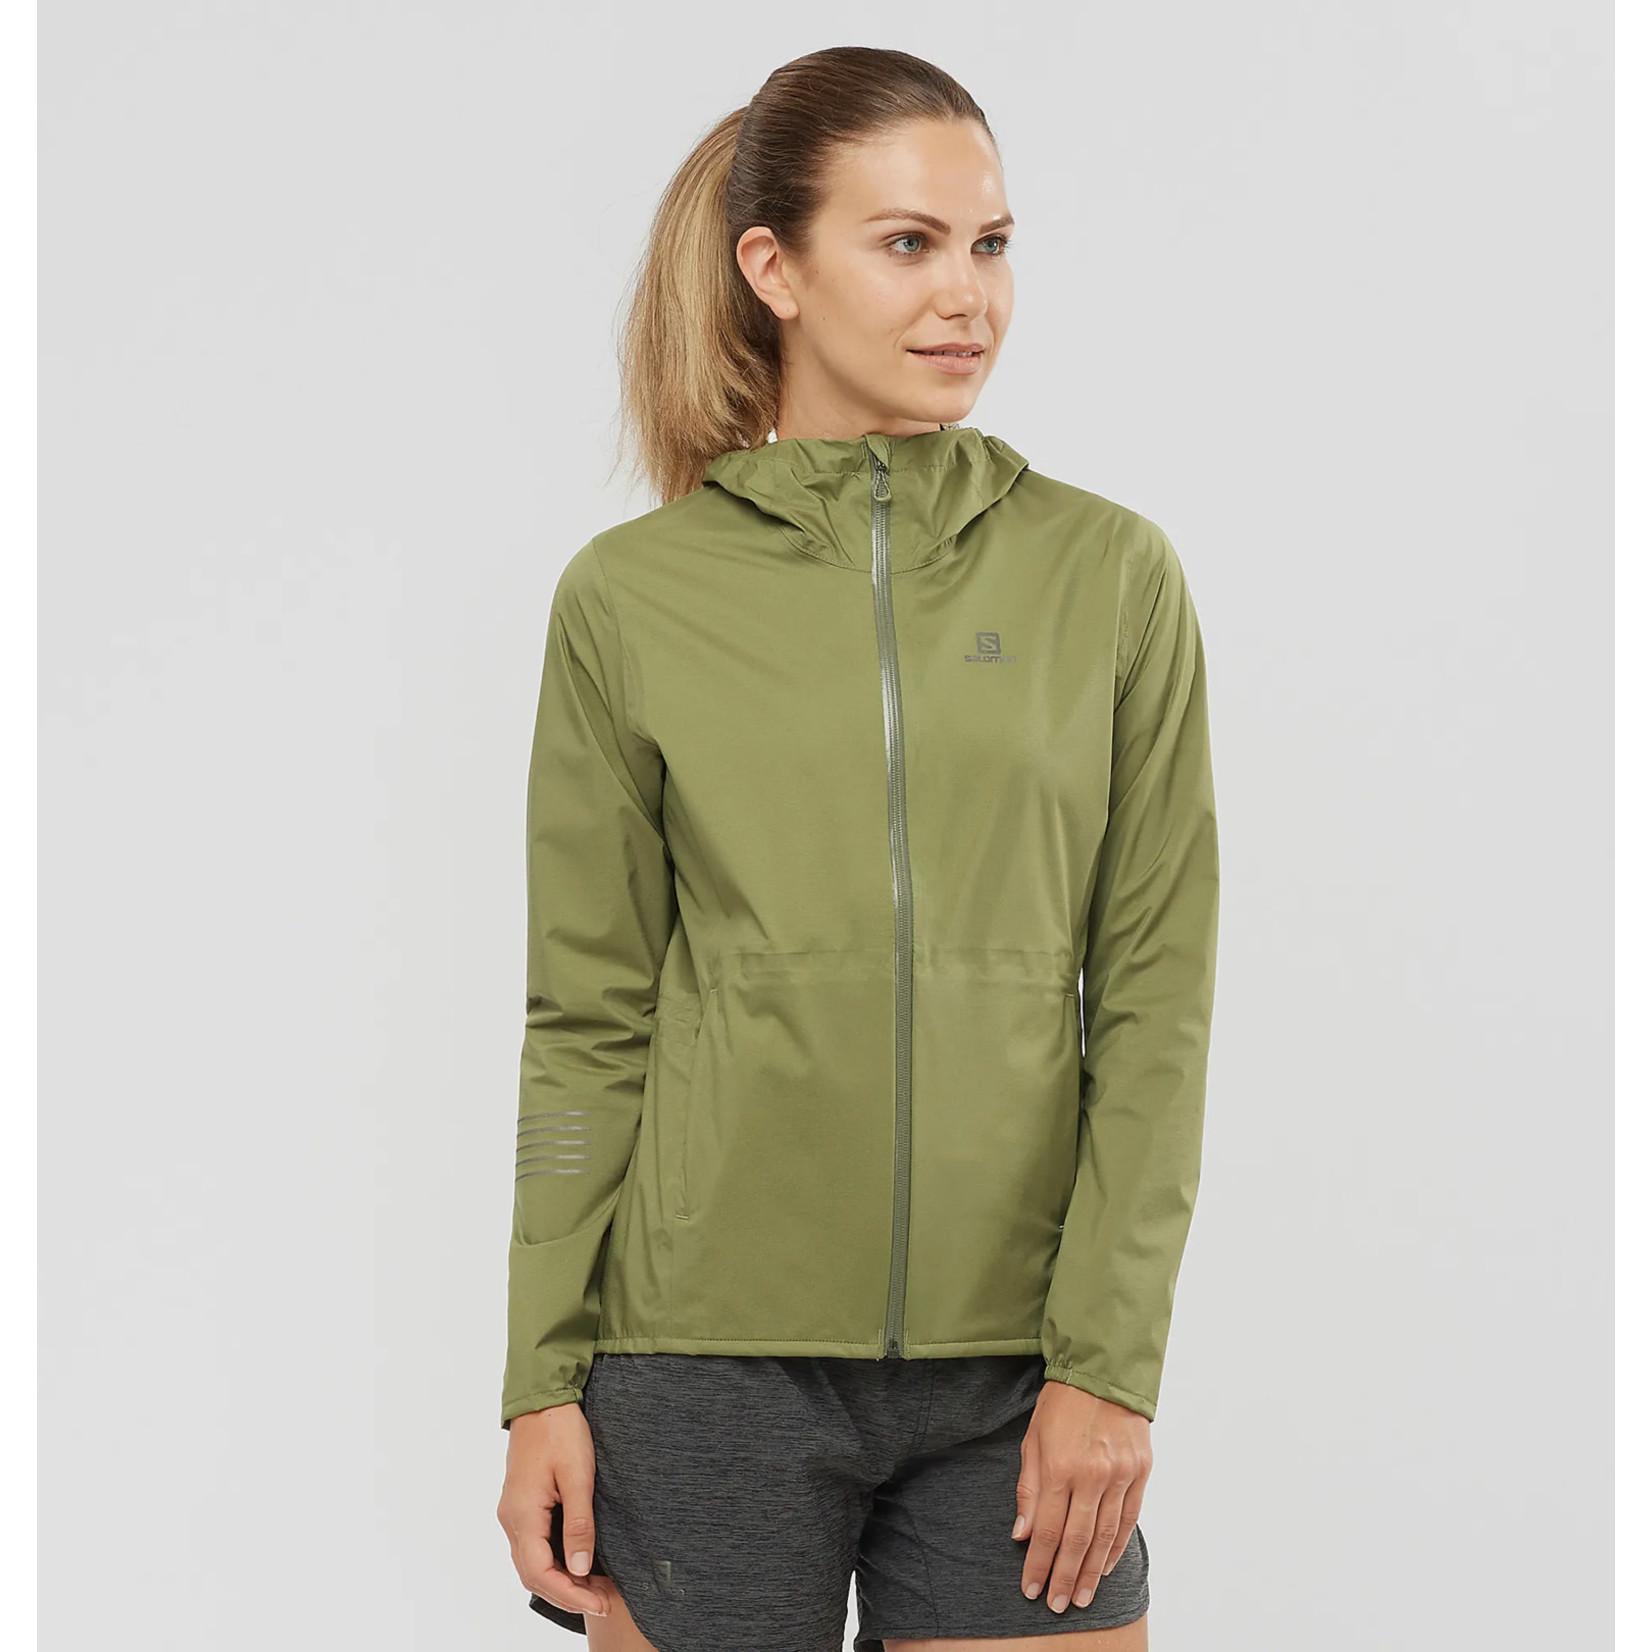 Salomon Salomon Women's Lightning Waterproof Jacket - Martini Olive